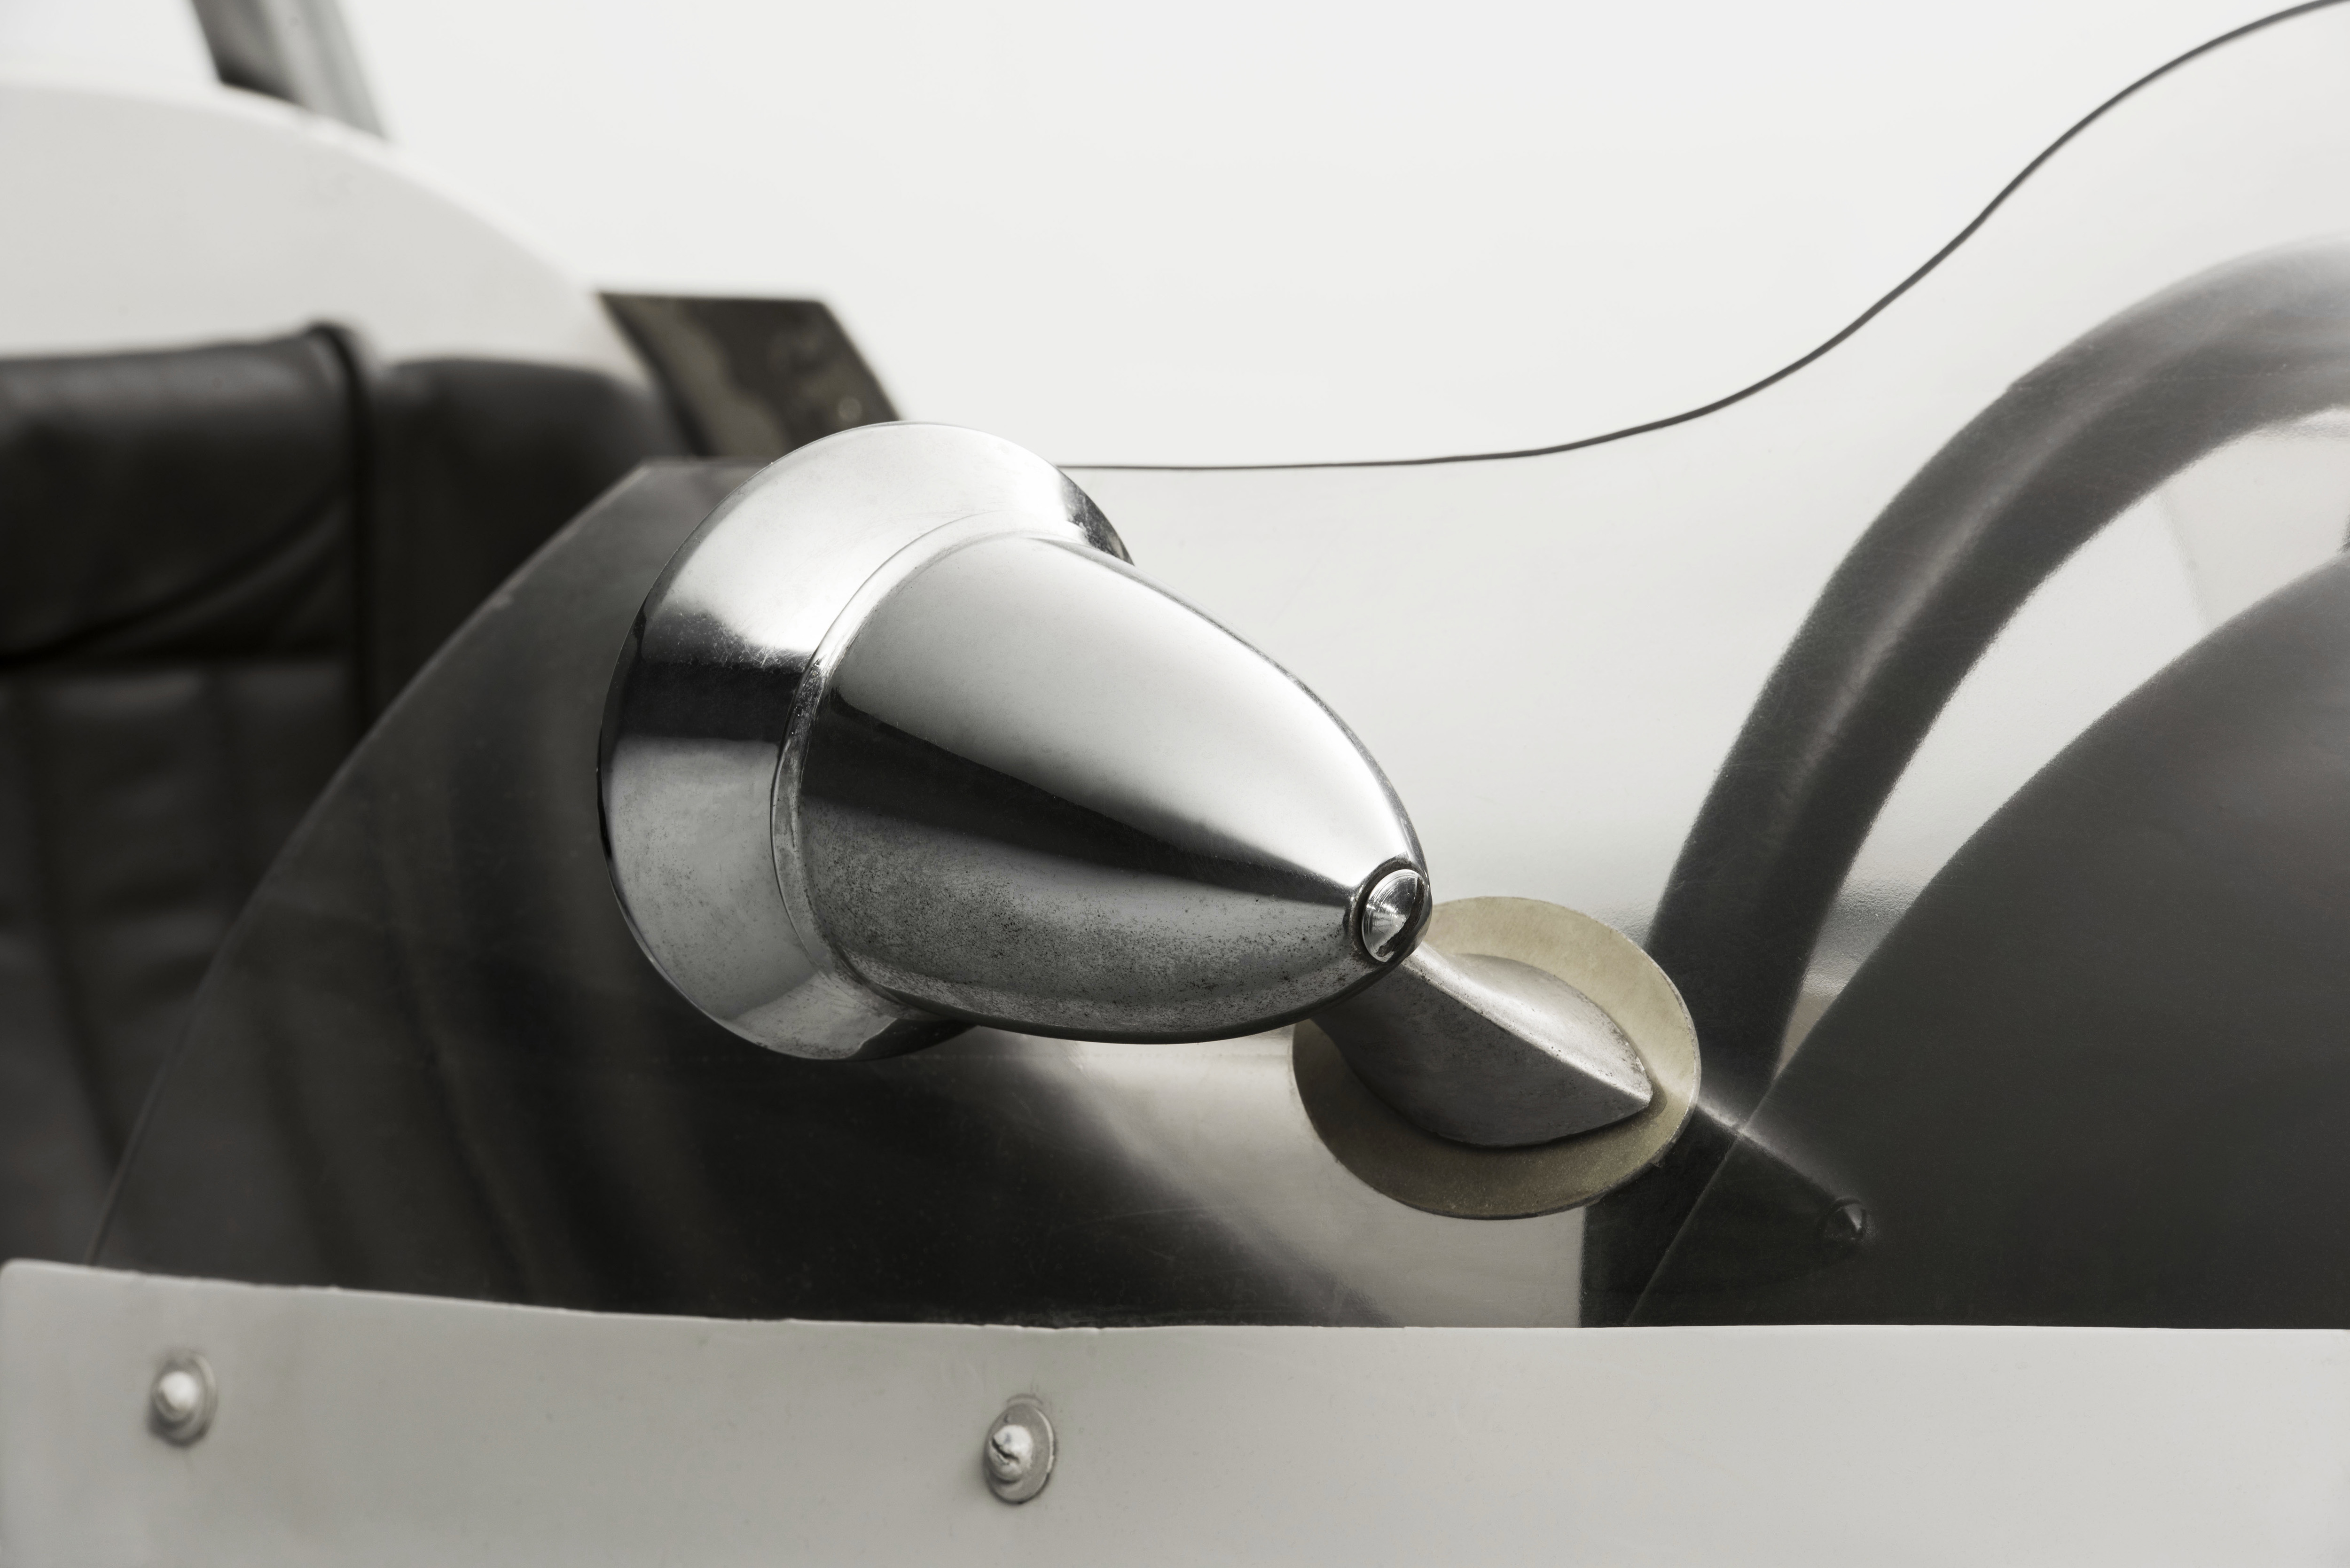 SKODA F3, Type 992 (1964): European-class Formula racing car - Image 2